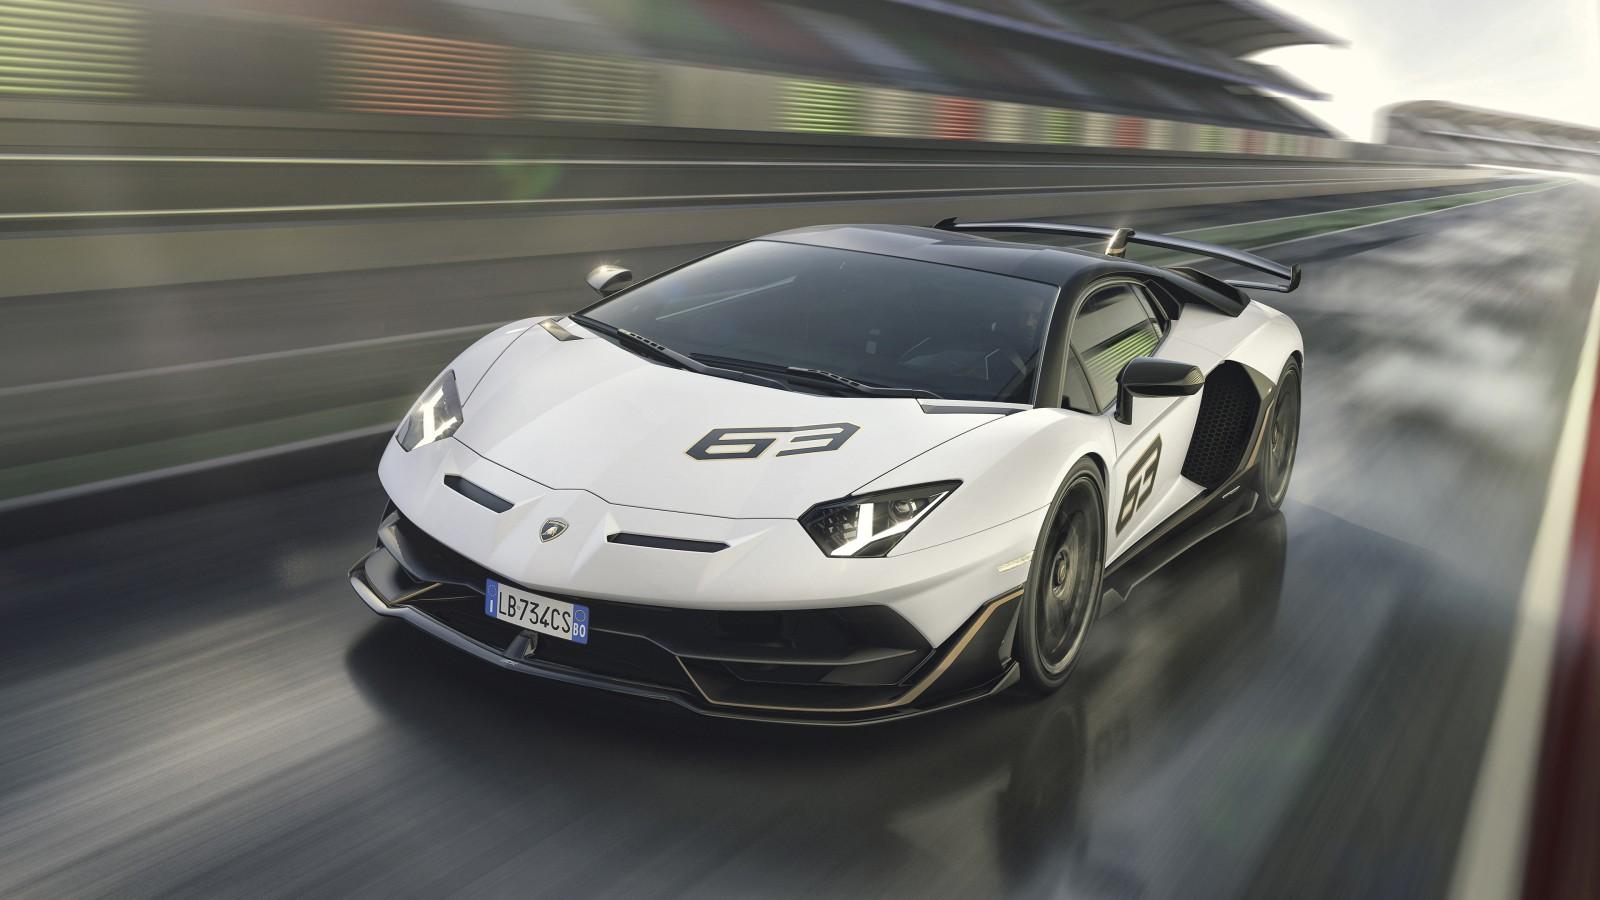 Lamborghini Aventador Svj 63 2019 4k 4 Wallpaper Hd Car Wallpapers Id 11011